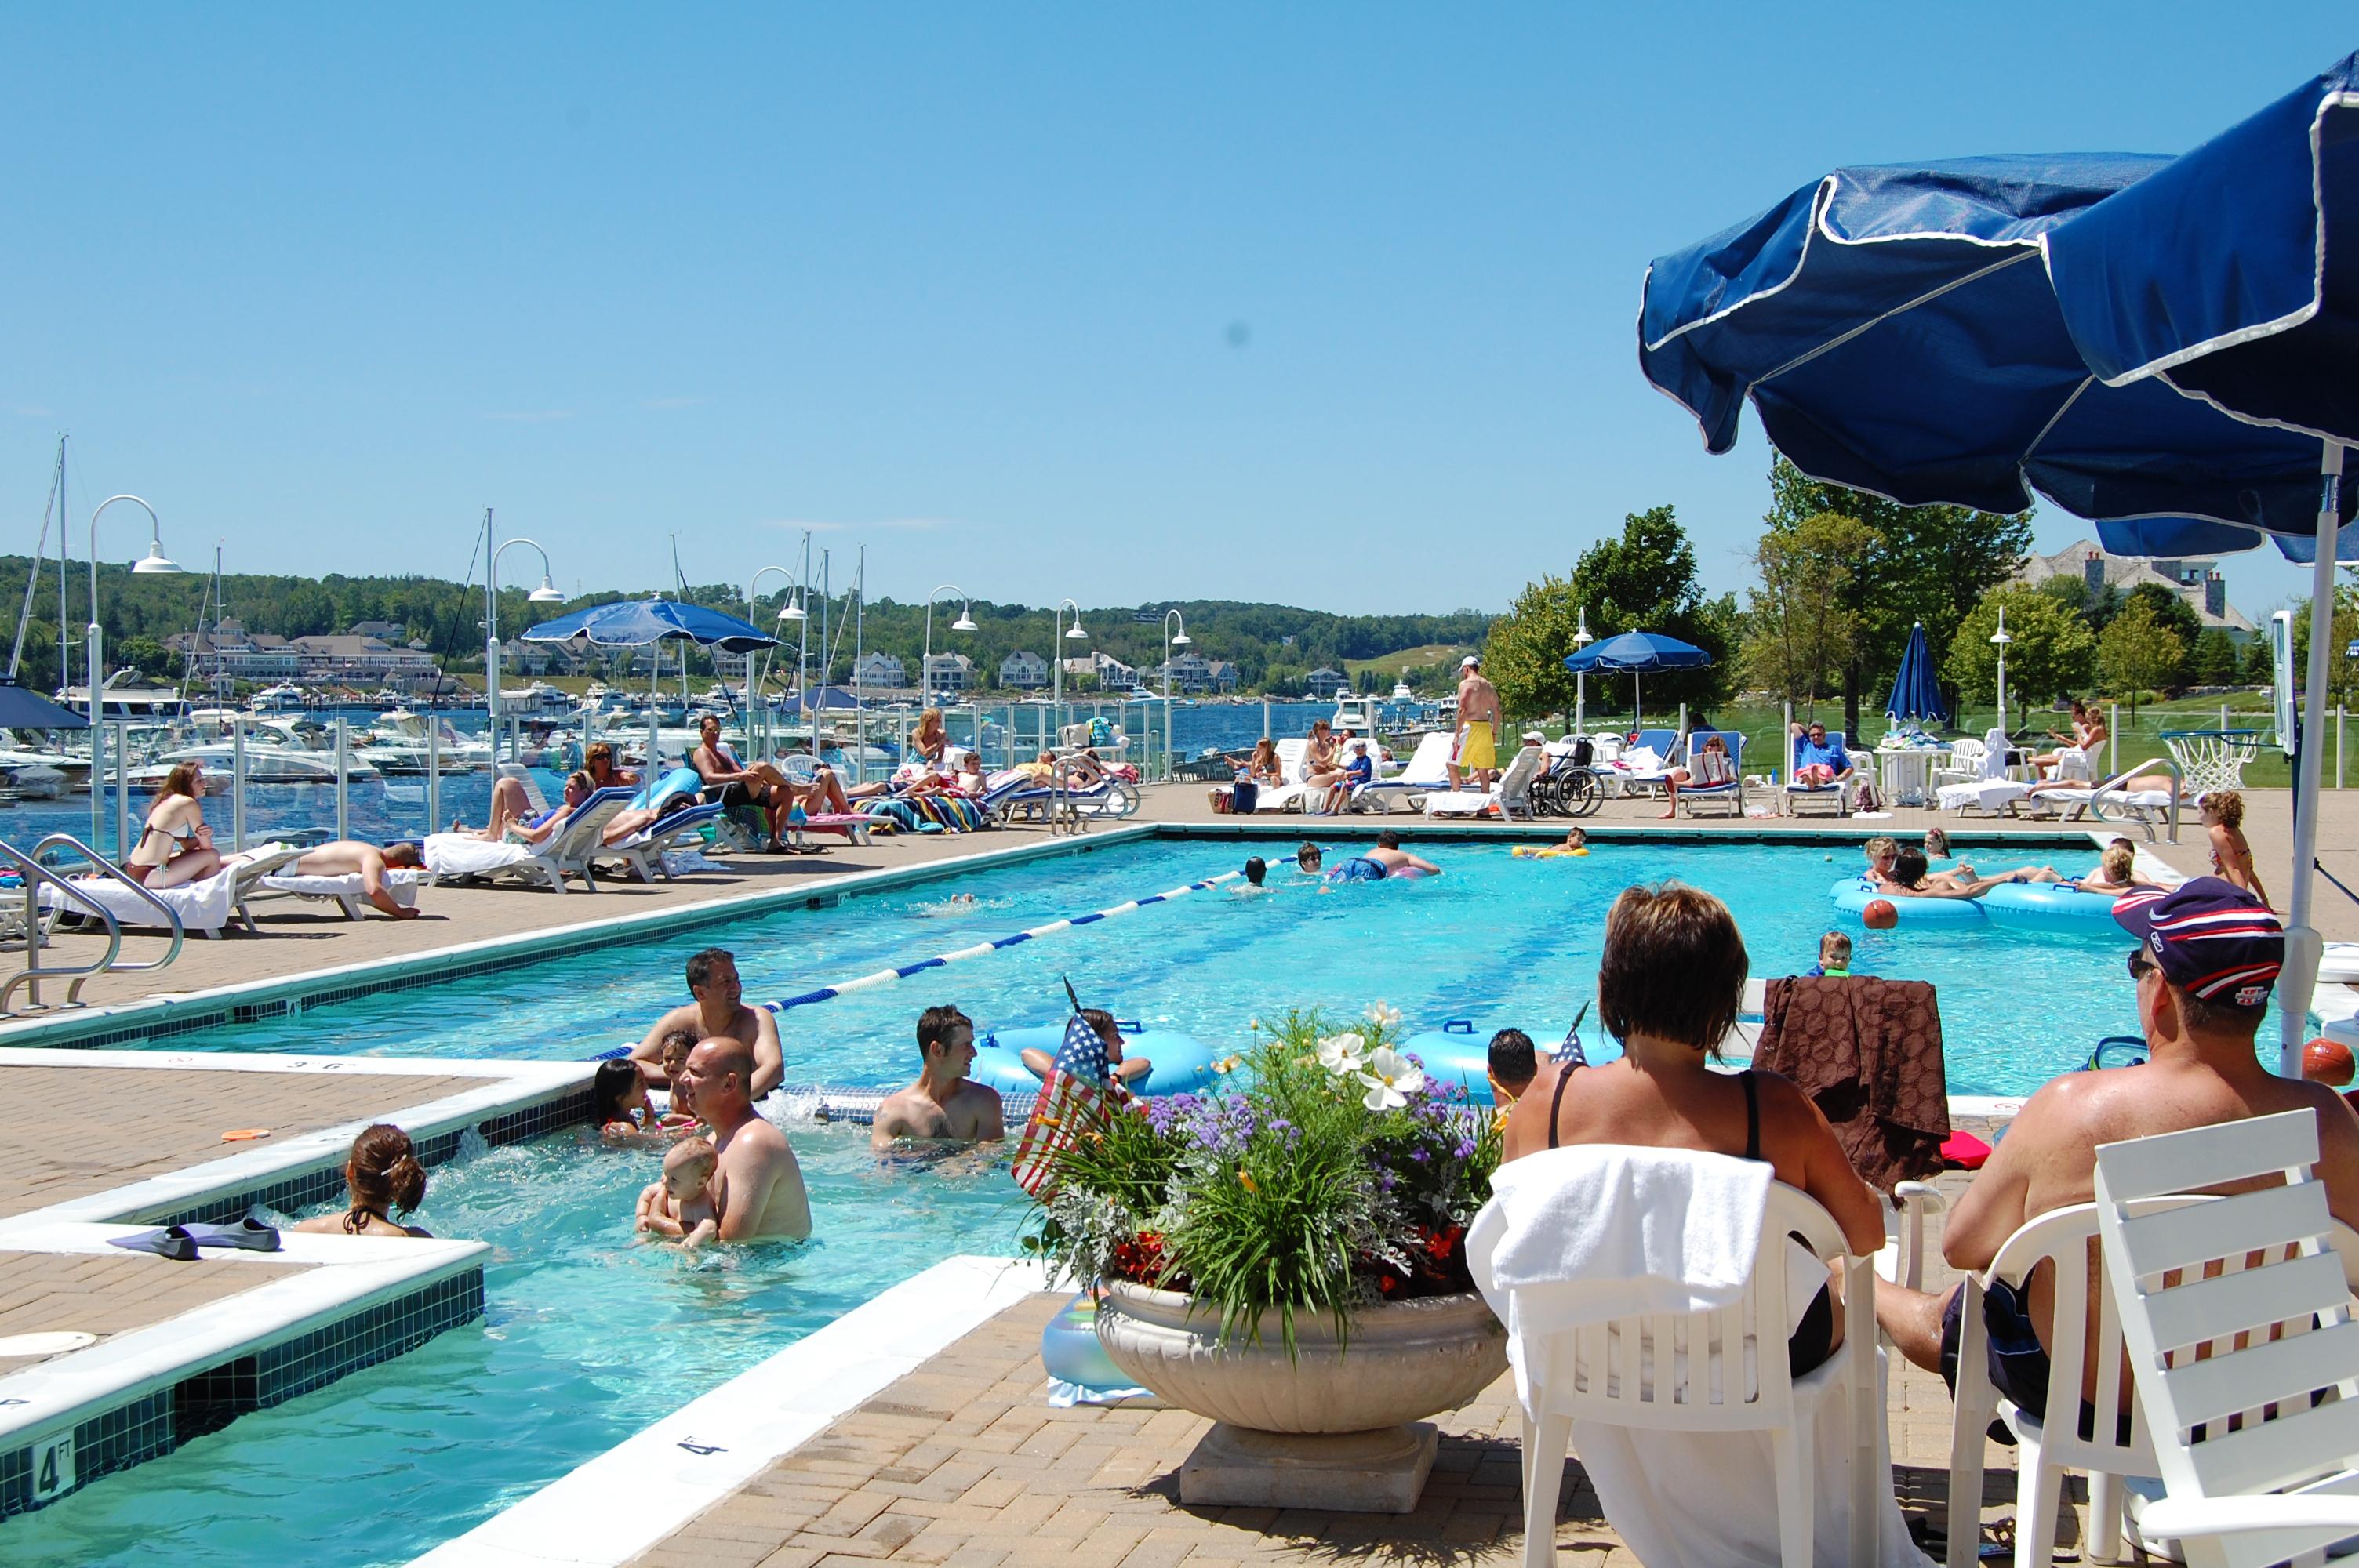 Enjoy the Summer Sun Poolside